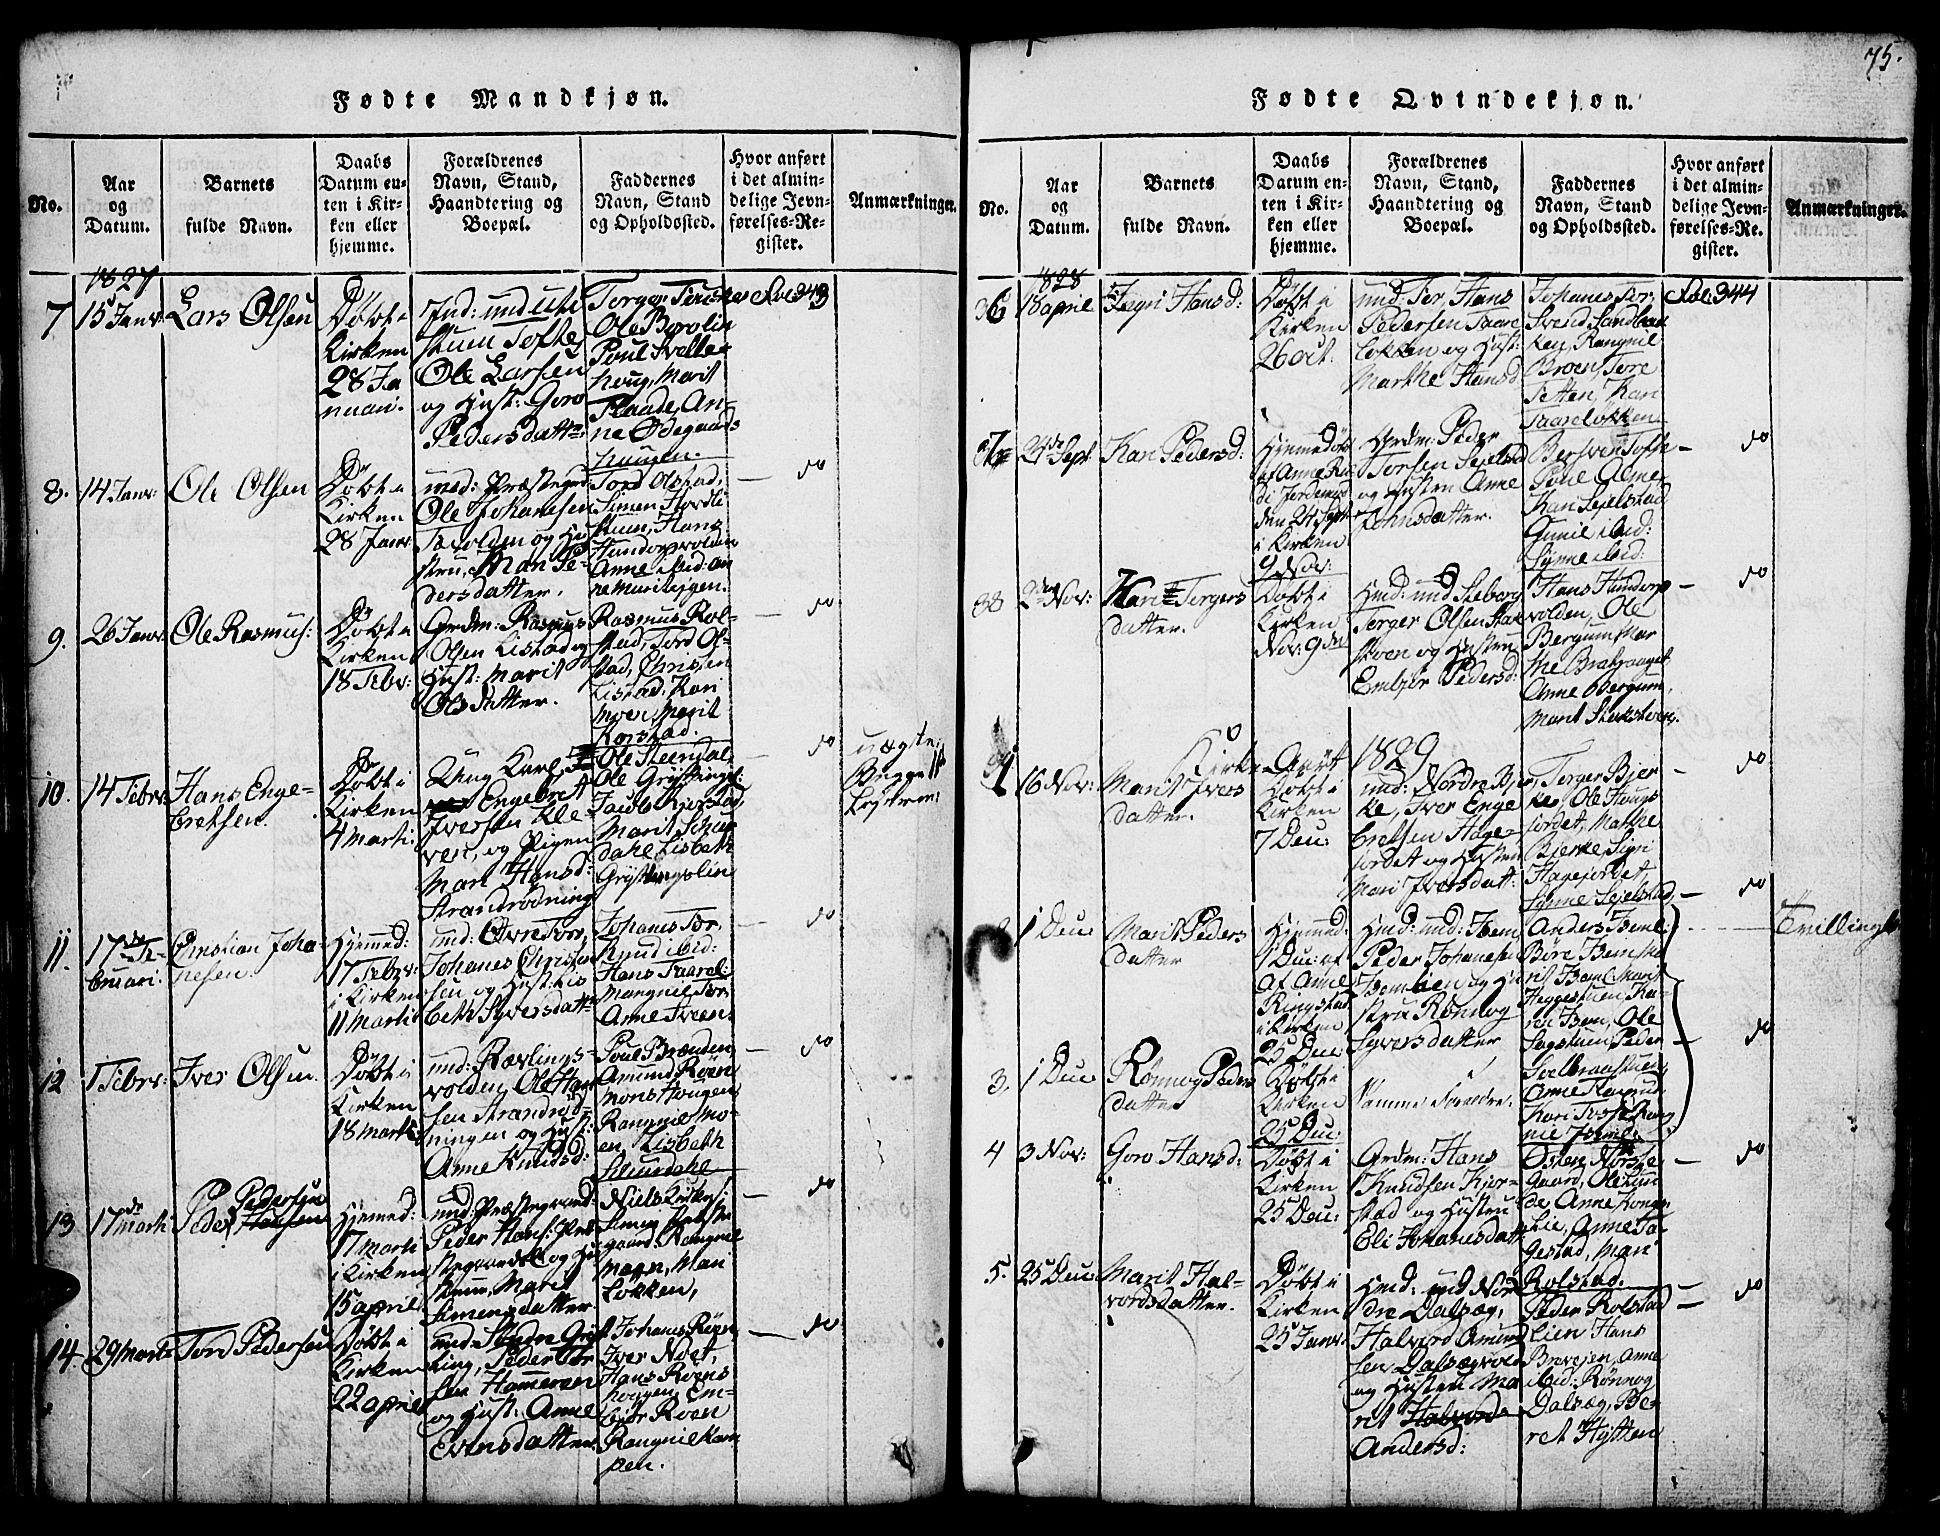 SAH, Fron prestekontor, H/Ha/Hab/L0001: Klokkerbok nr. 1, 1816-1843, s. 75